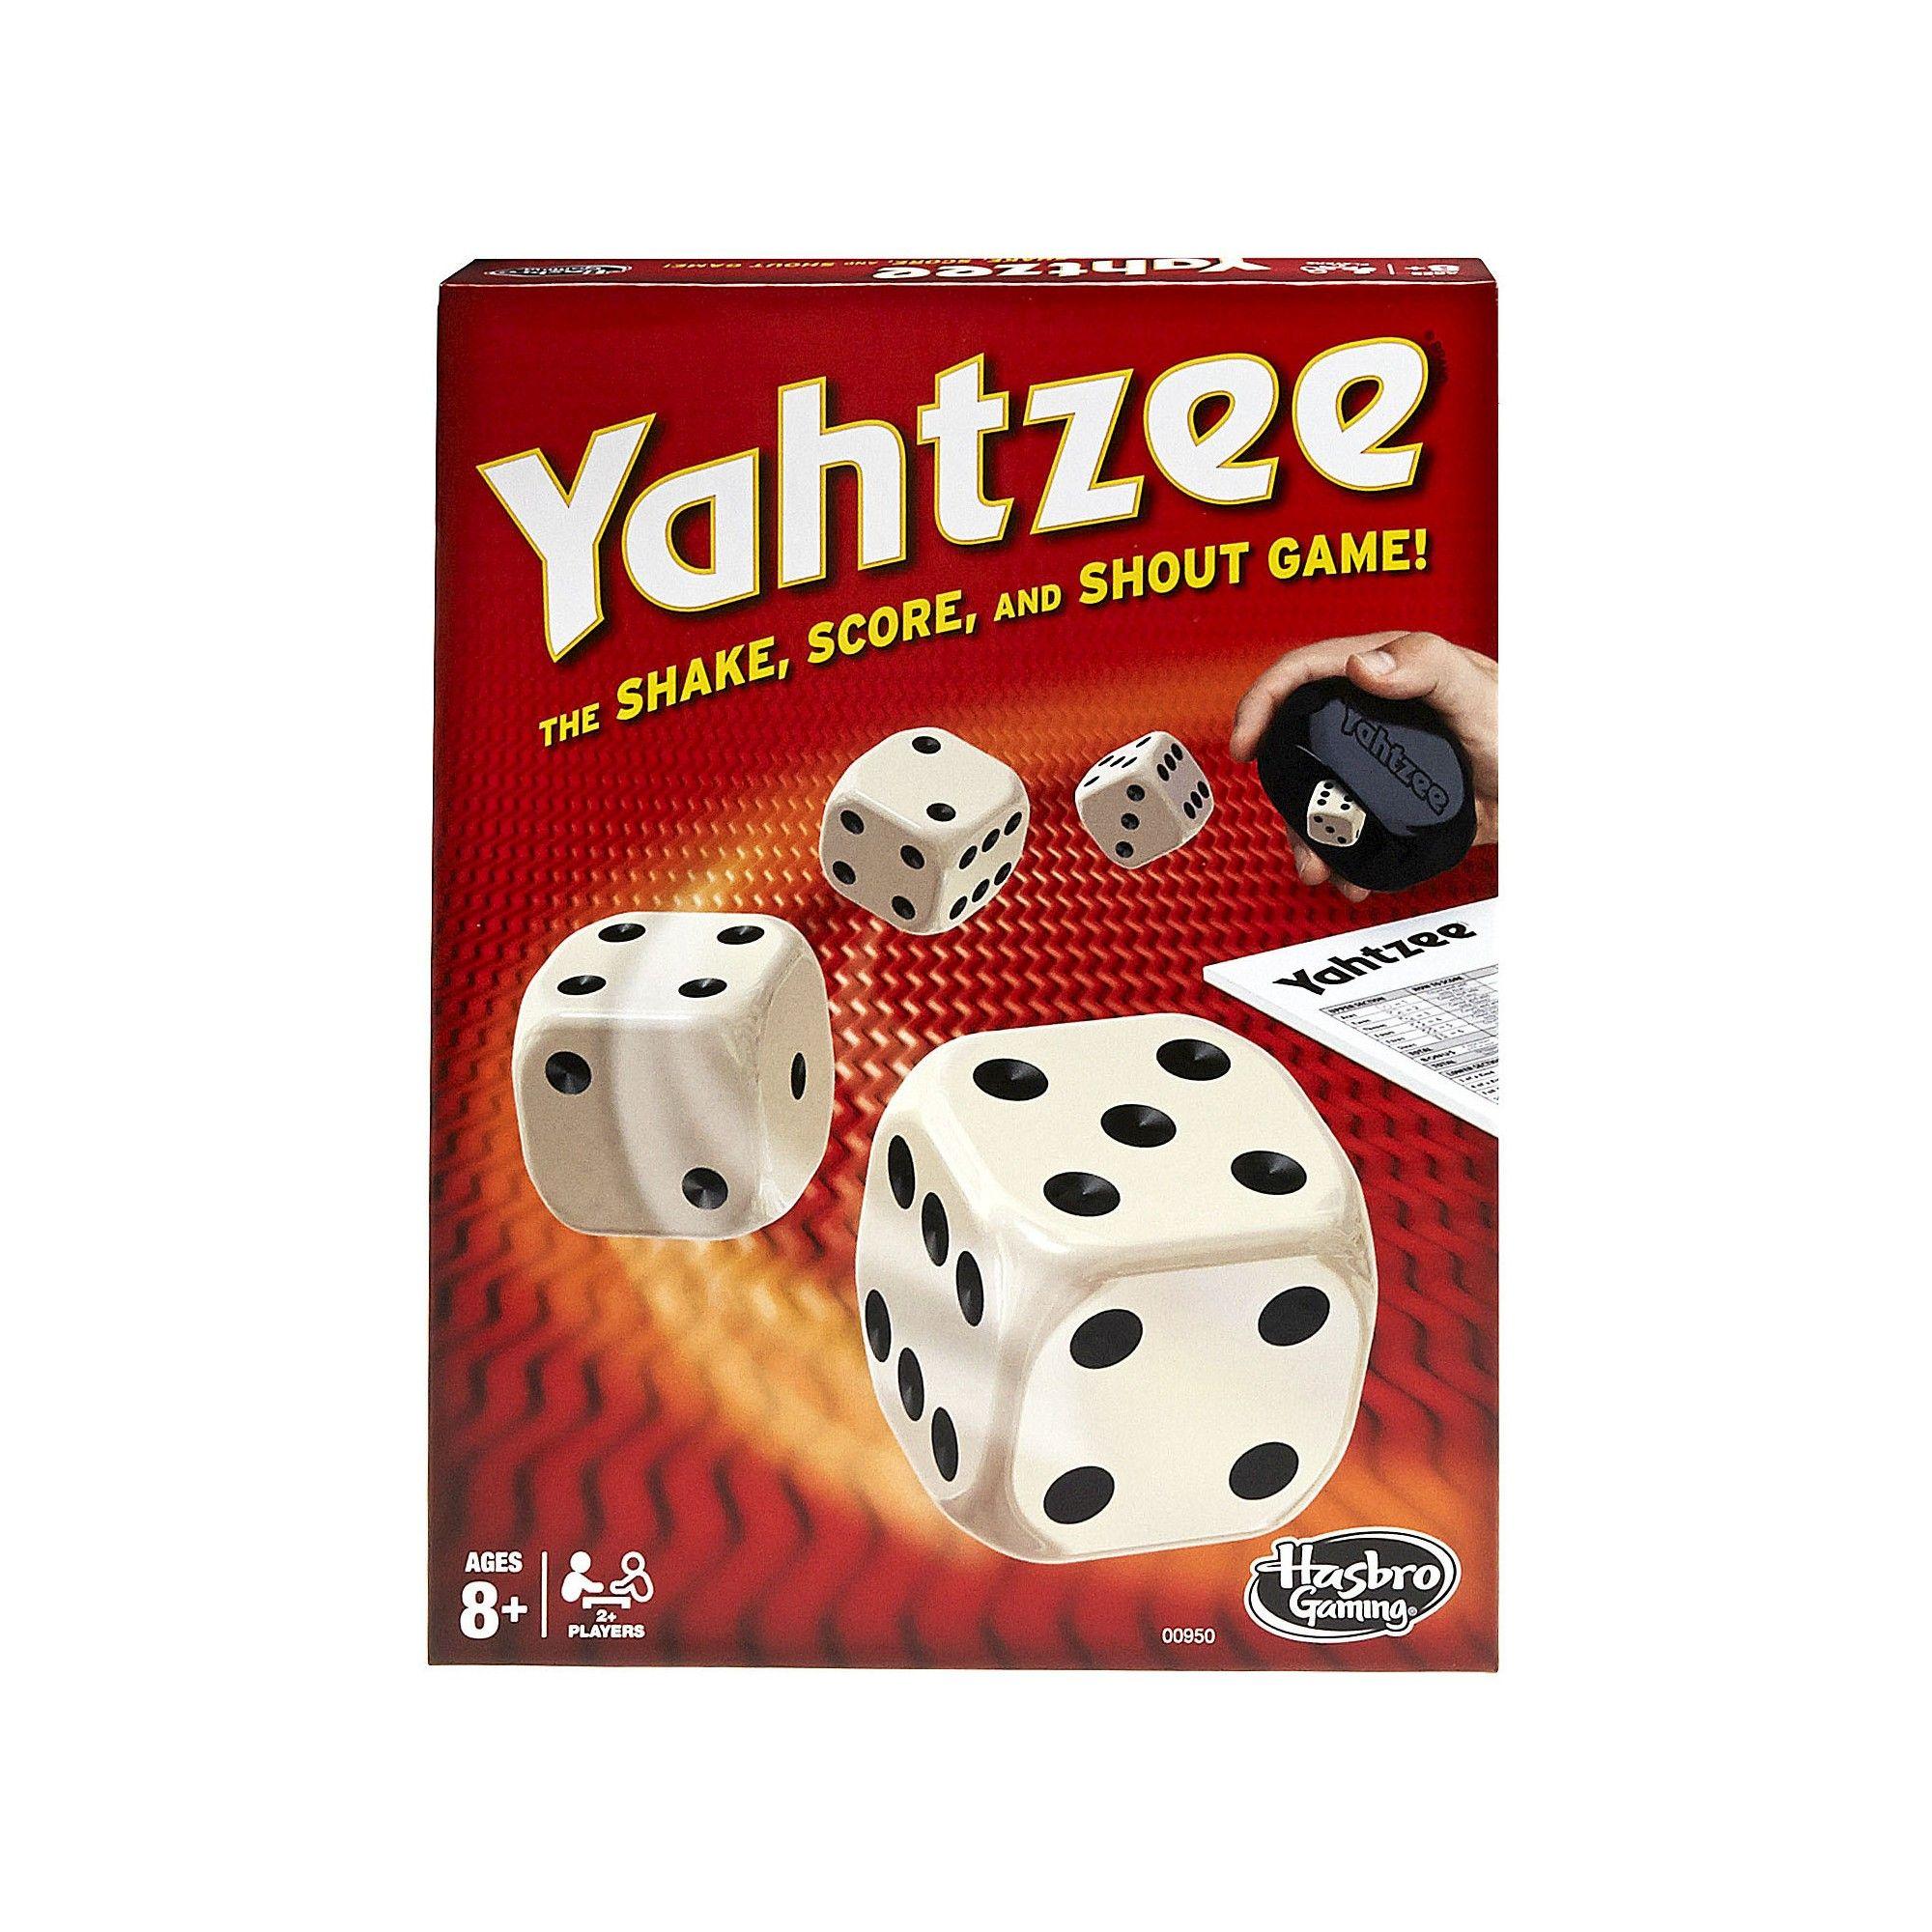 Yahtzee Dice Game, board games Dice games, Games, Board